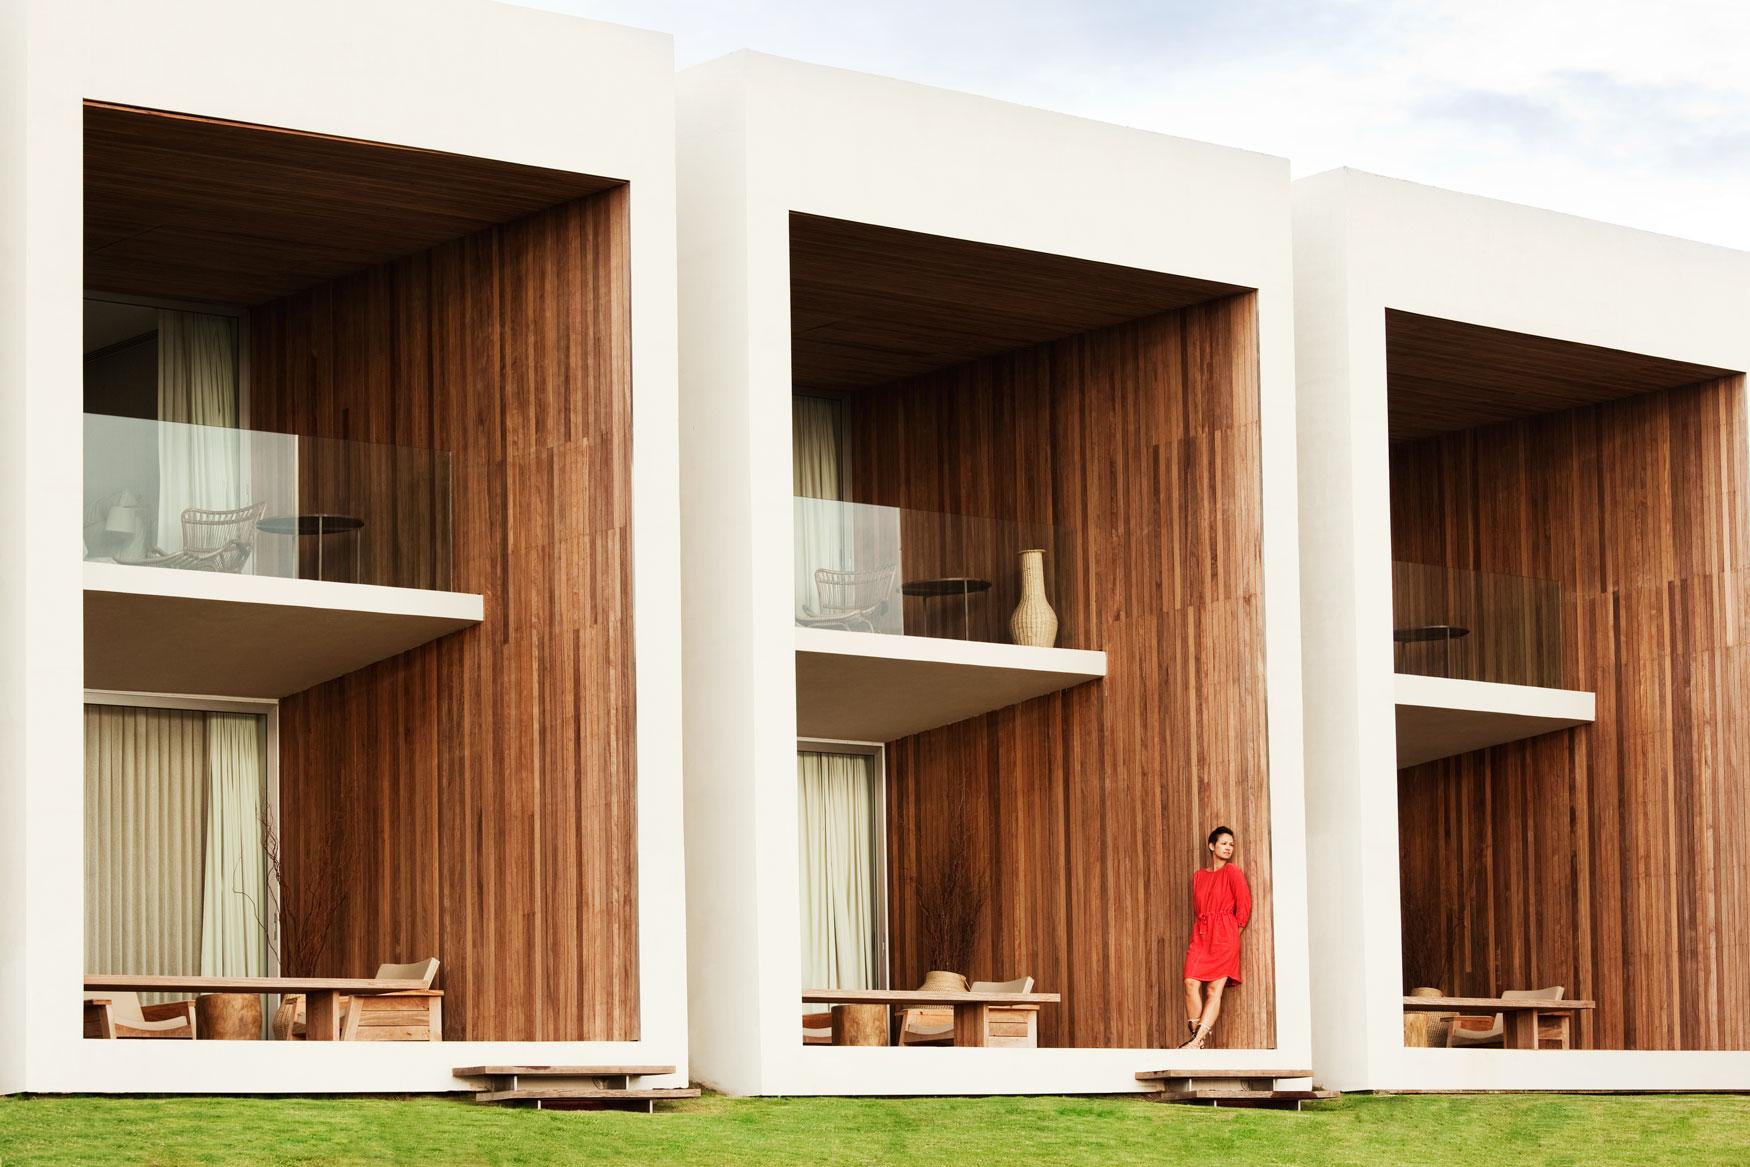 Luxury hotel Fasano Boa Vista photographed by Martin Adolfsson